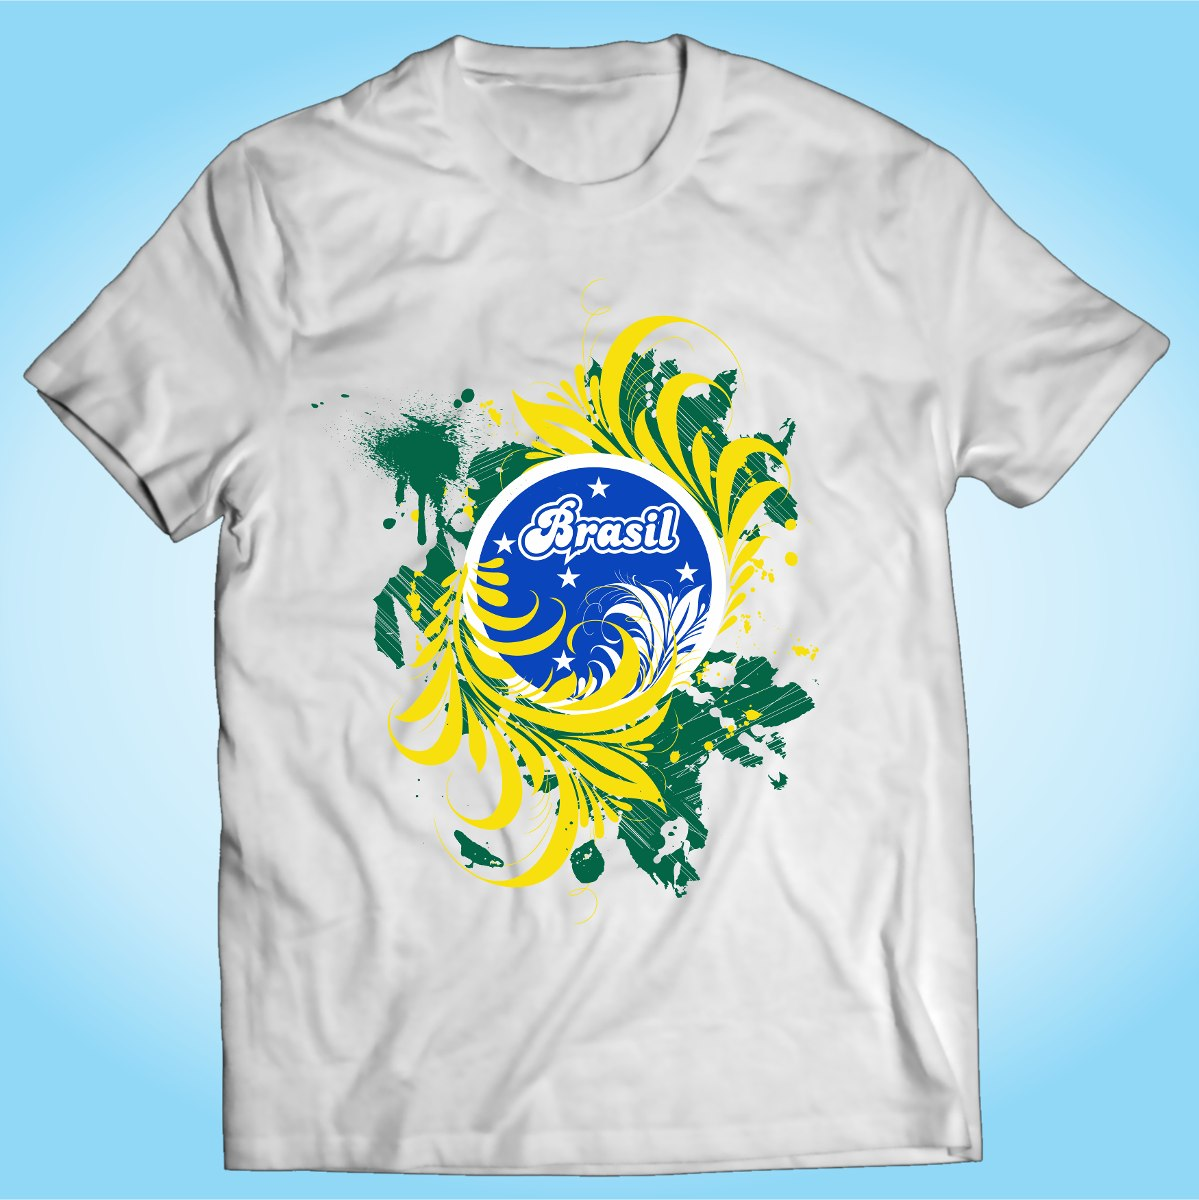 camisa brasil aquarela bandeira samba natureza personalizada. Carregando  zoom. b2cdf61064f86